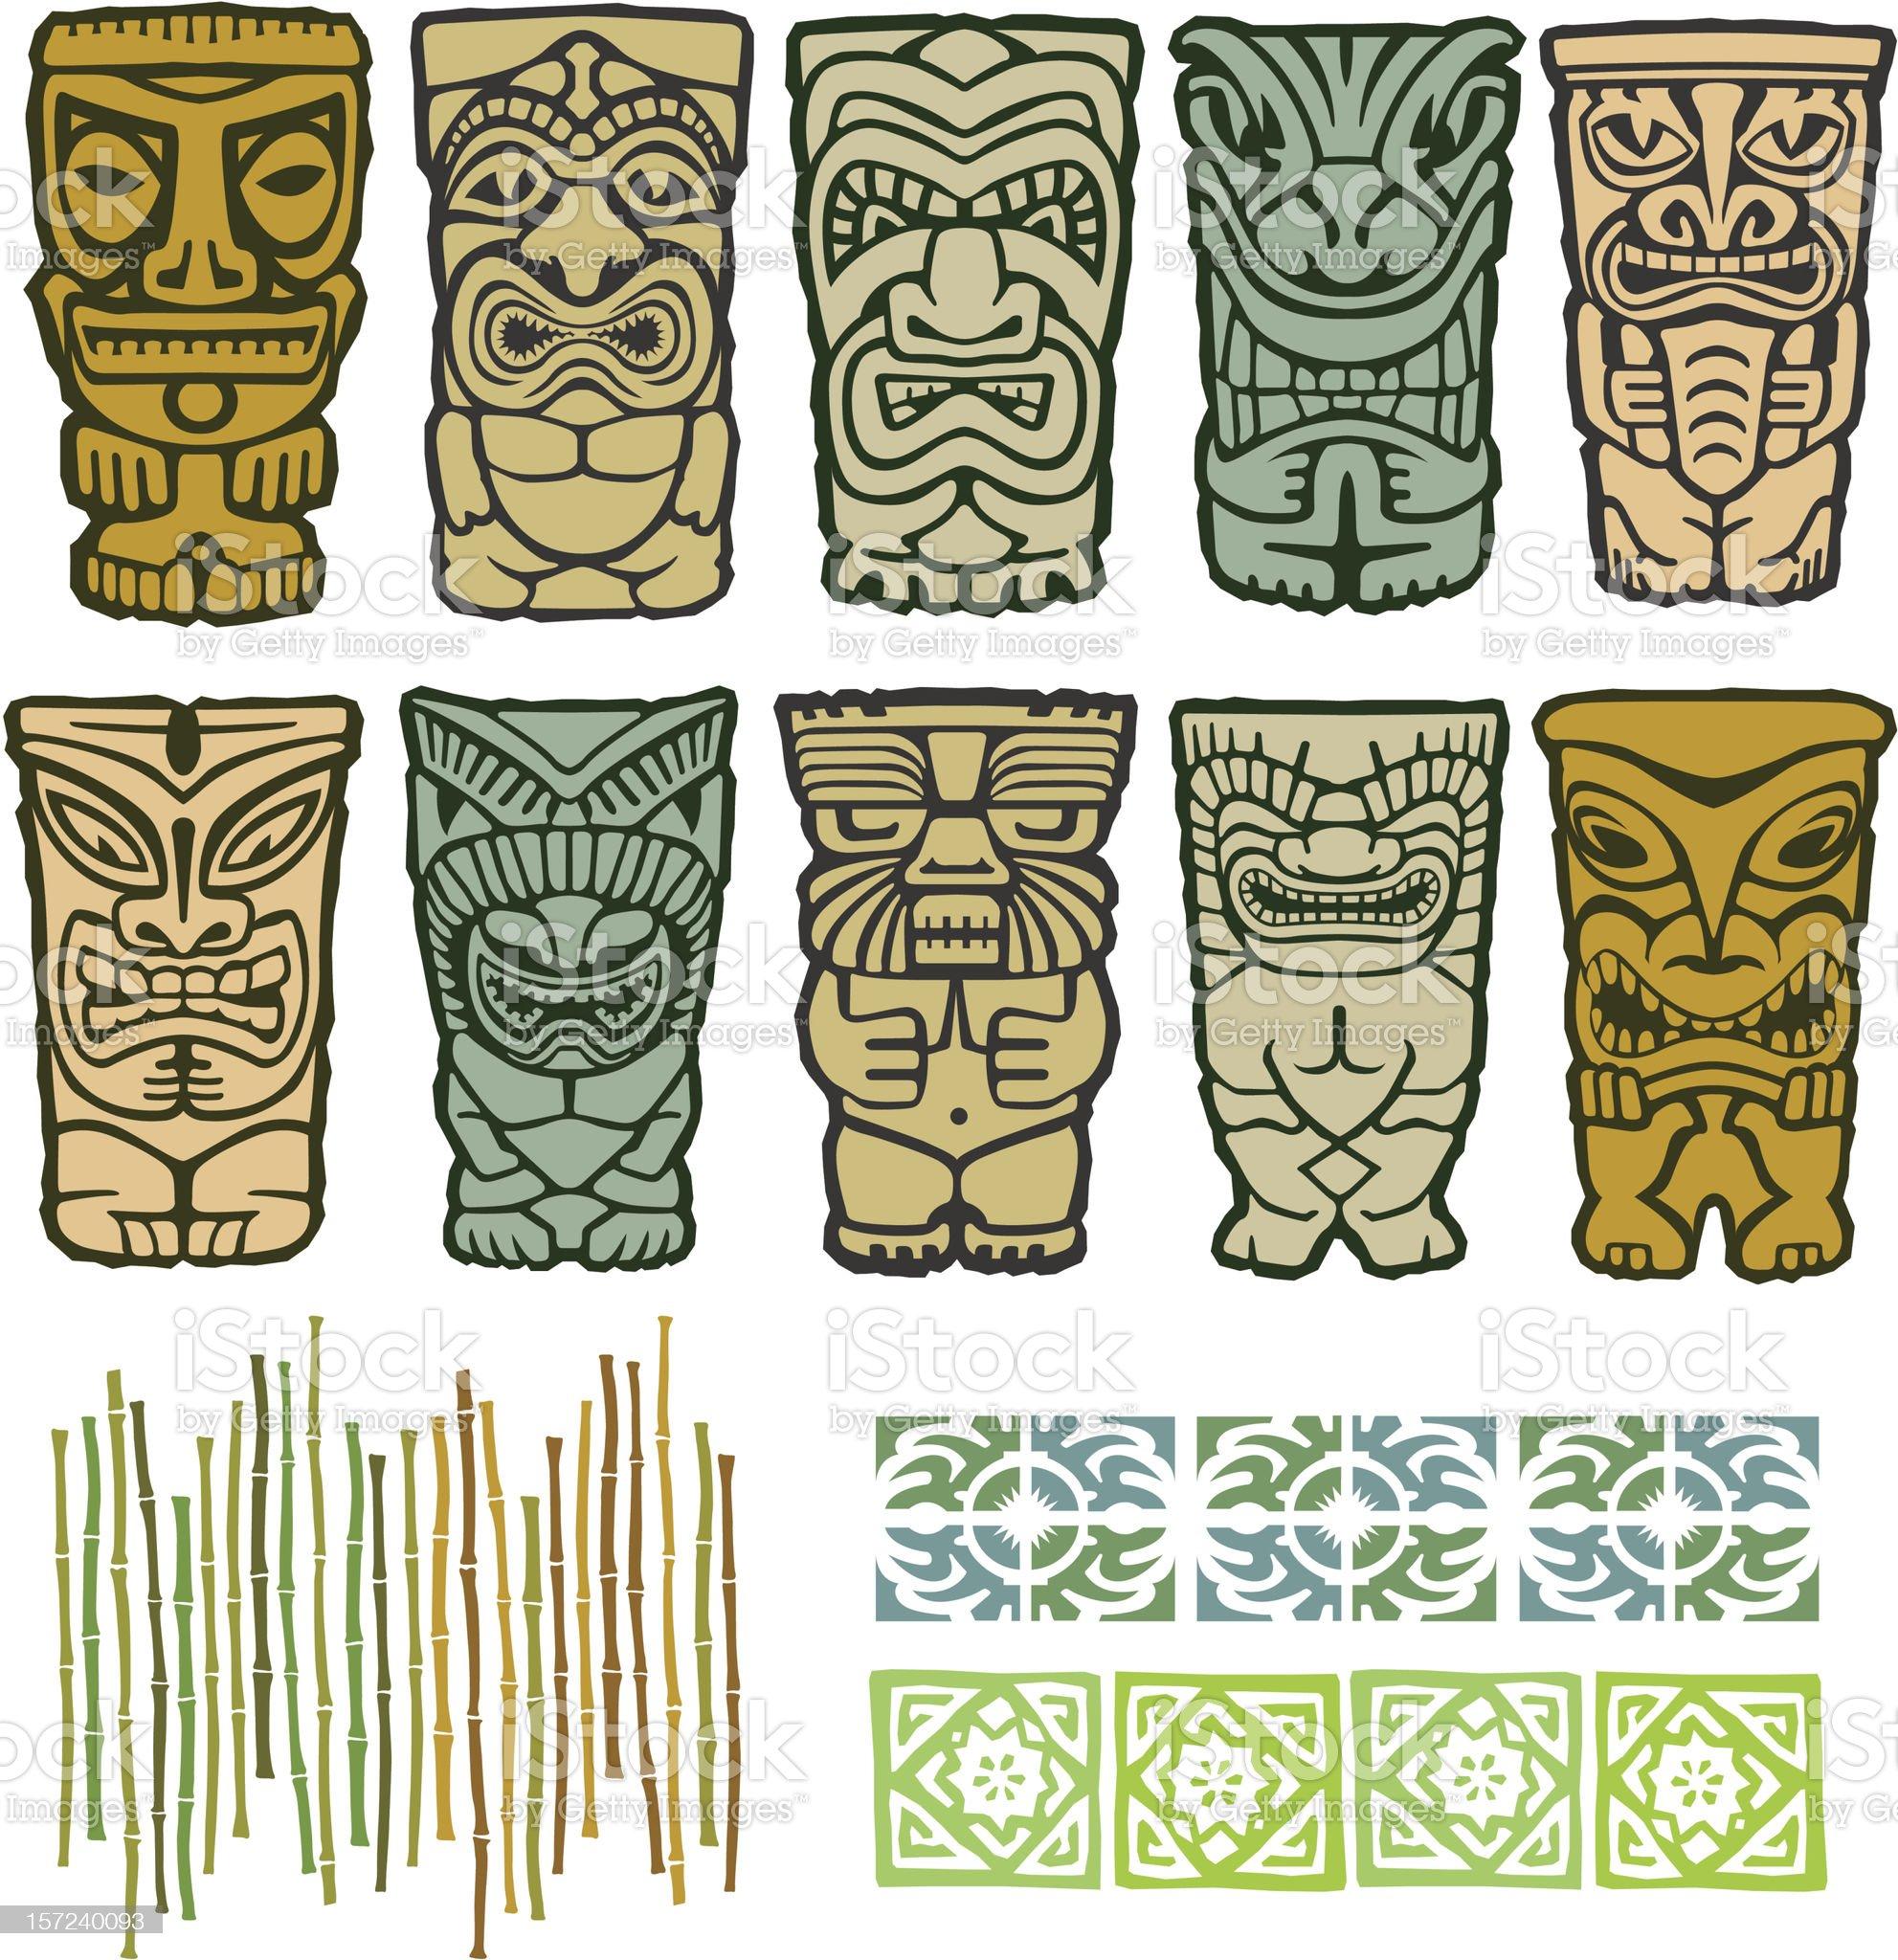 Tribal Tiki Vector Totem Illustrations royalty-free stock vector art